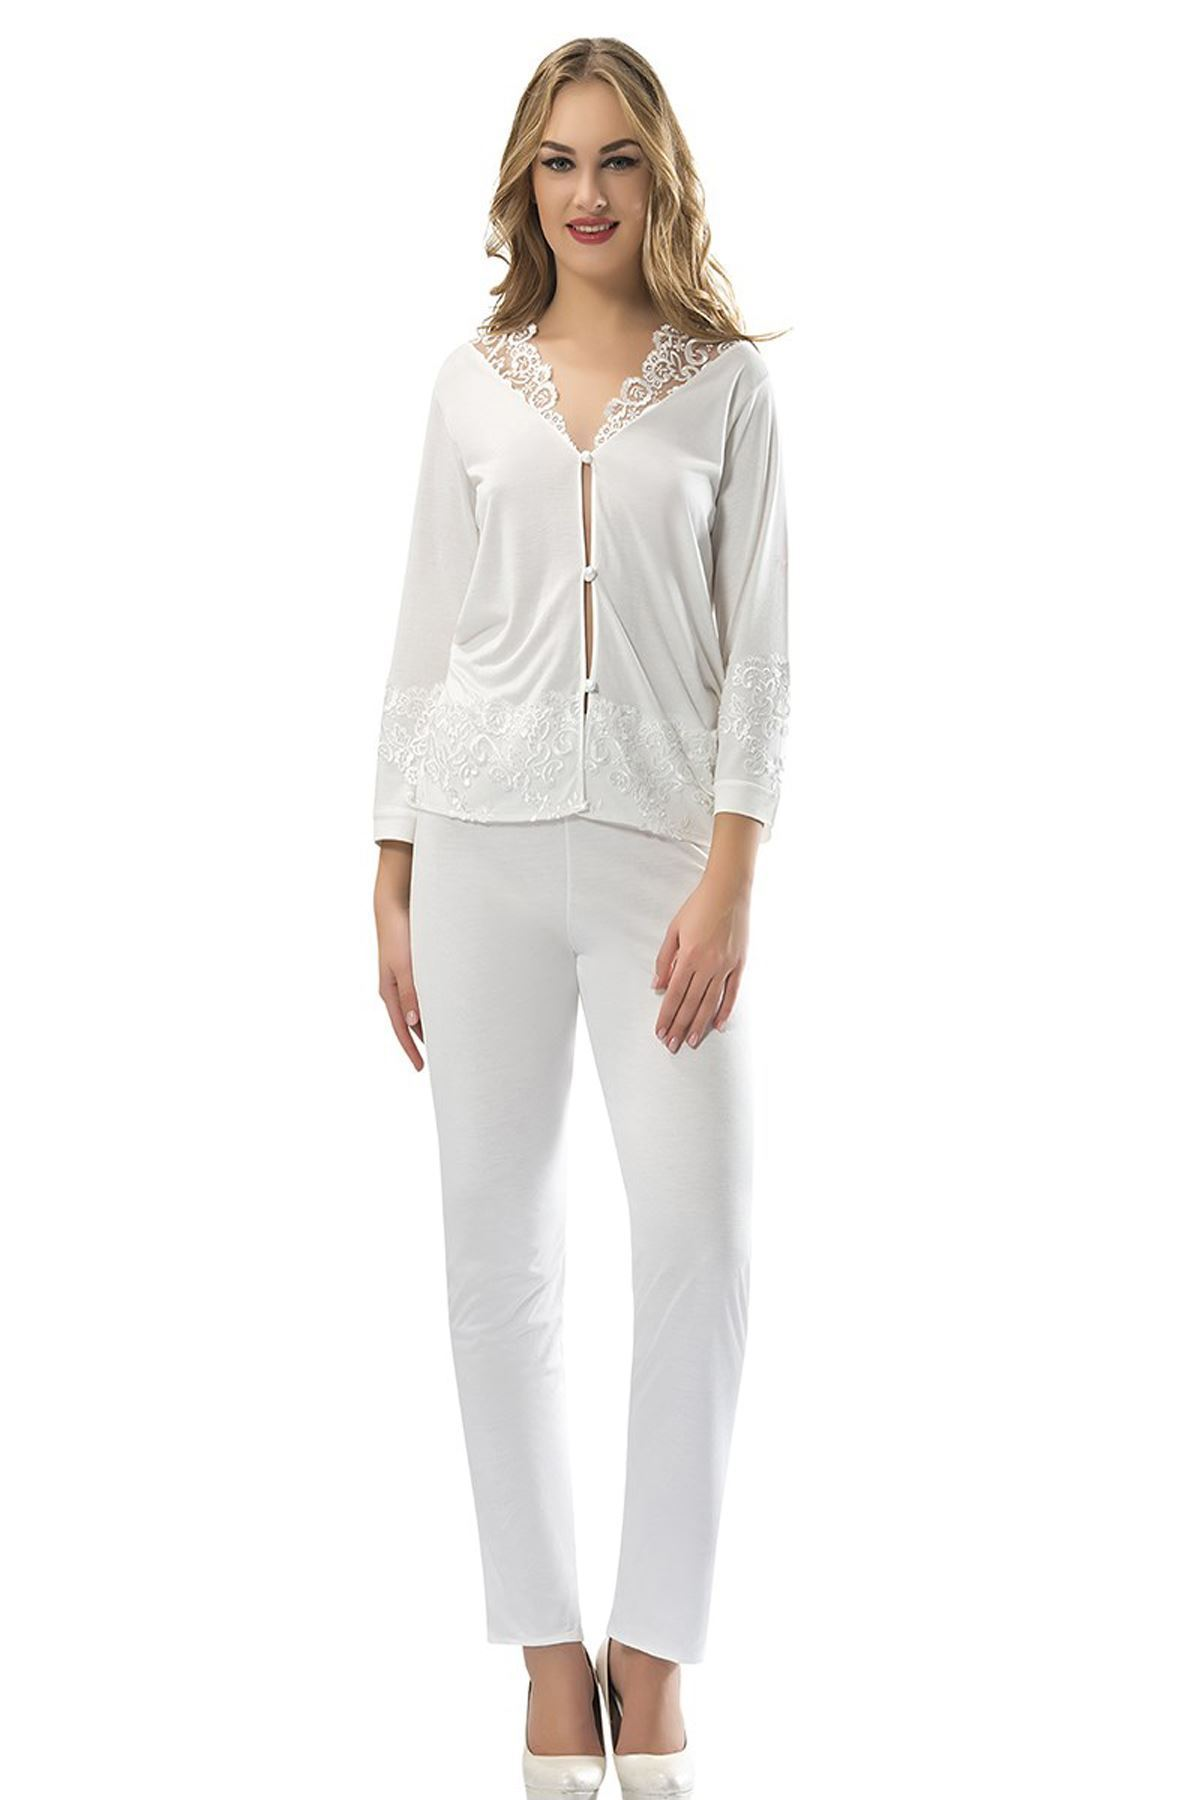 Sistina 1576 penye çeyizlik pijama takım